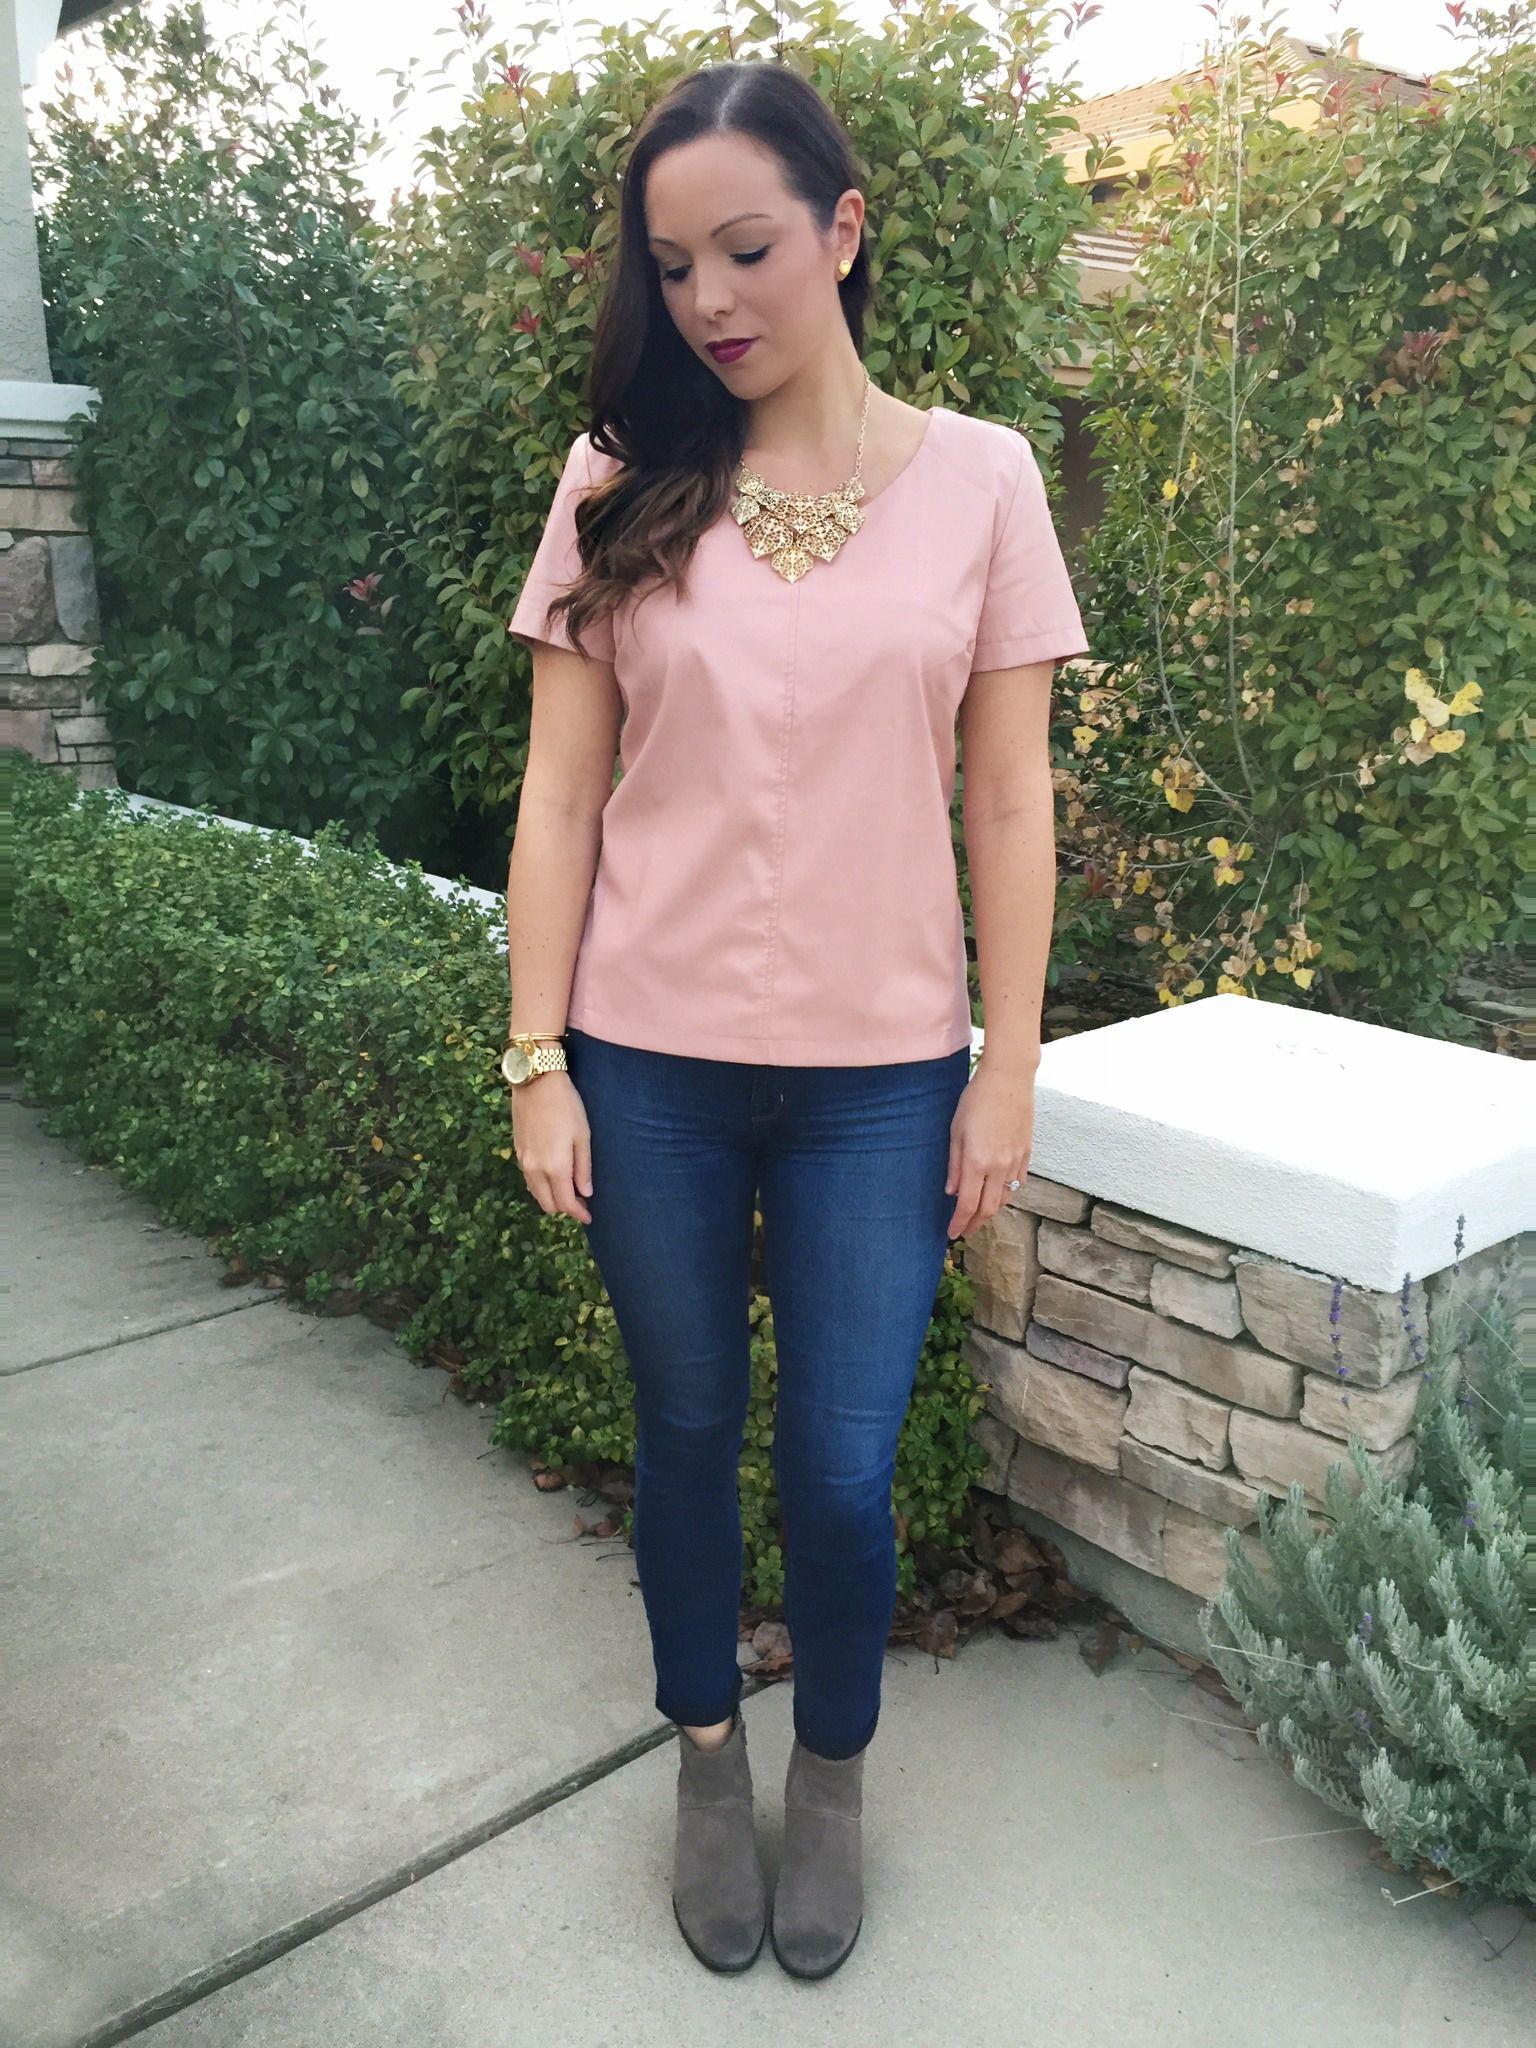 leather top #pinkleather #vegan  www.tailoredtogether.com